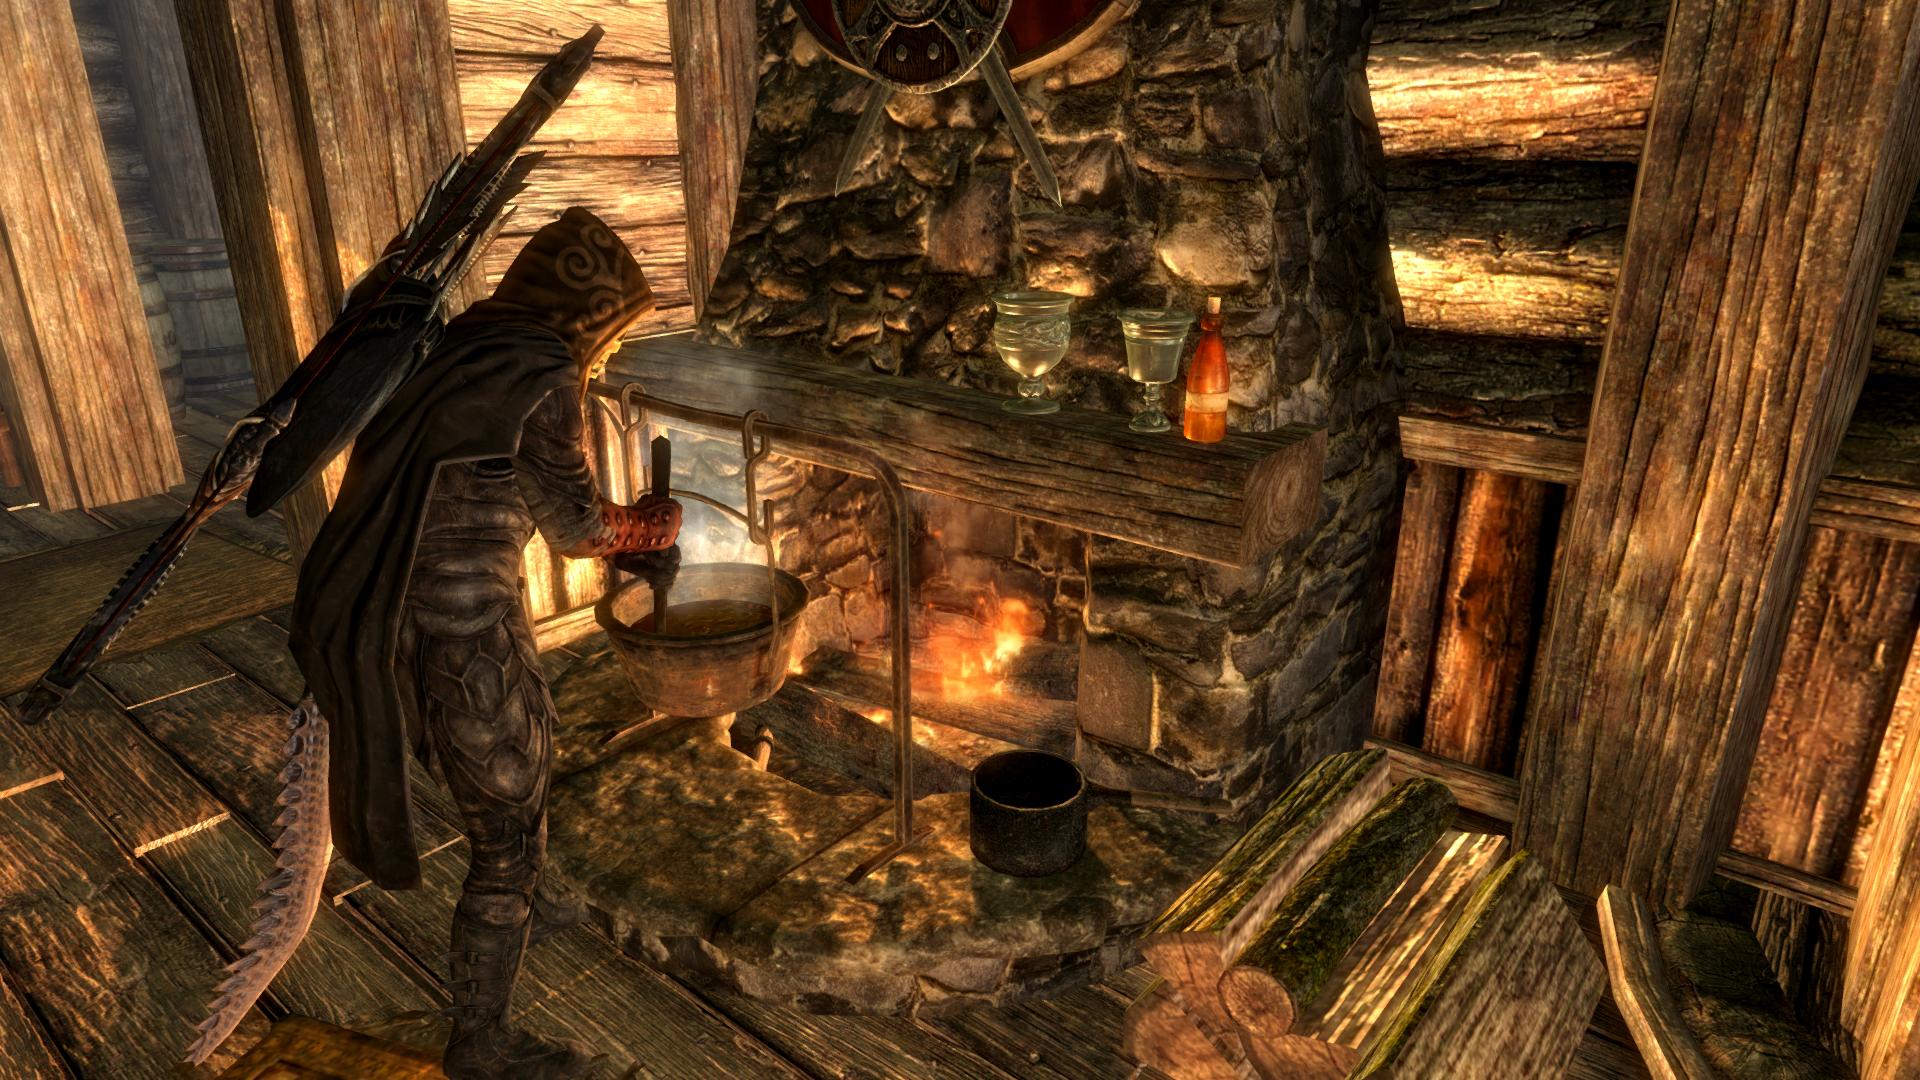 Cooking elder scrolls fandom powered by wikia cookinginskyrimcc cooking in skyrim forumfinder Gallery